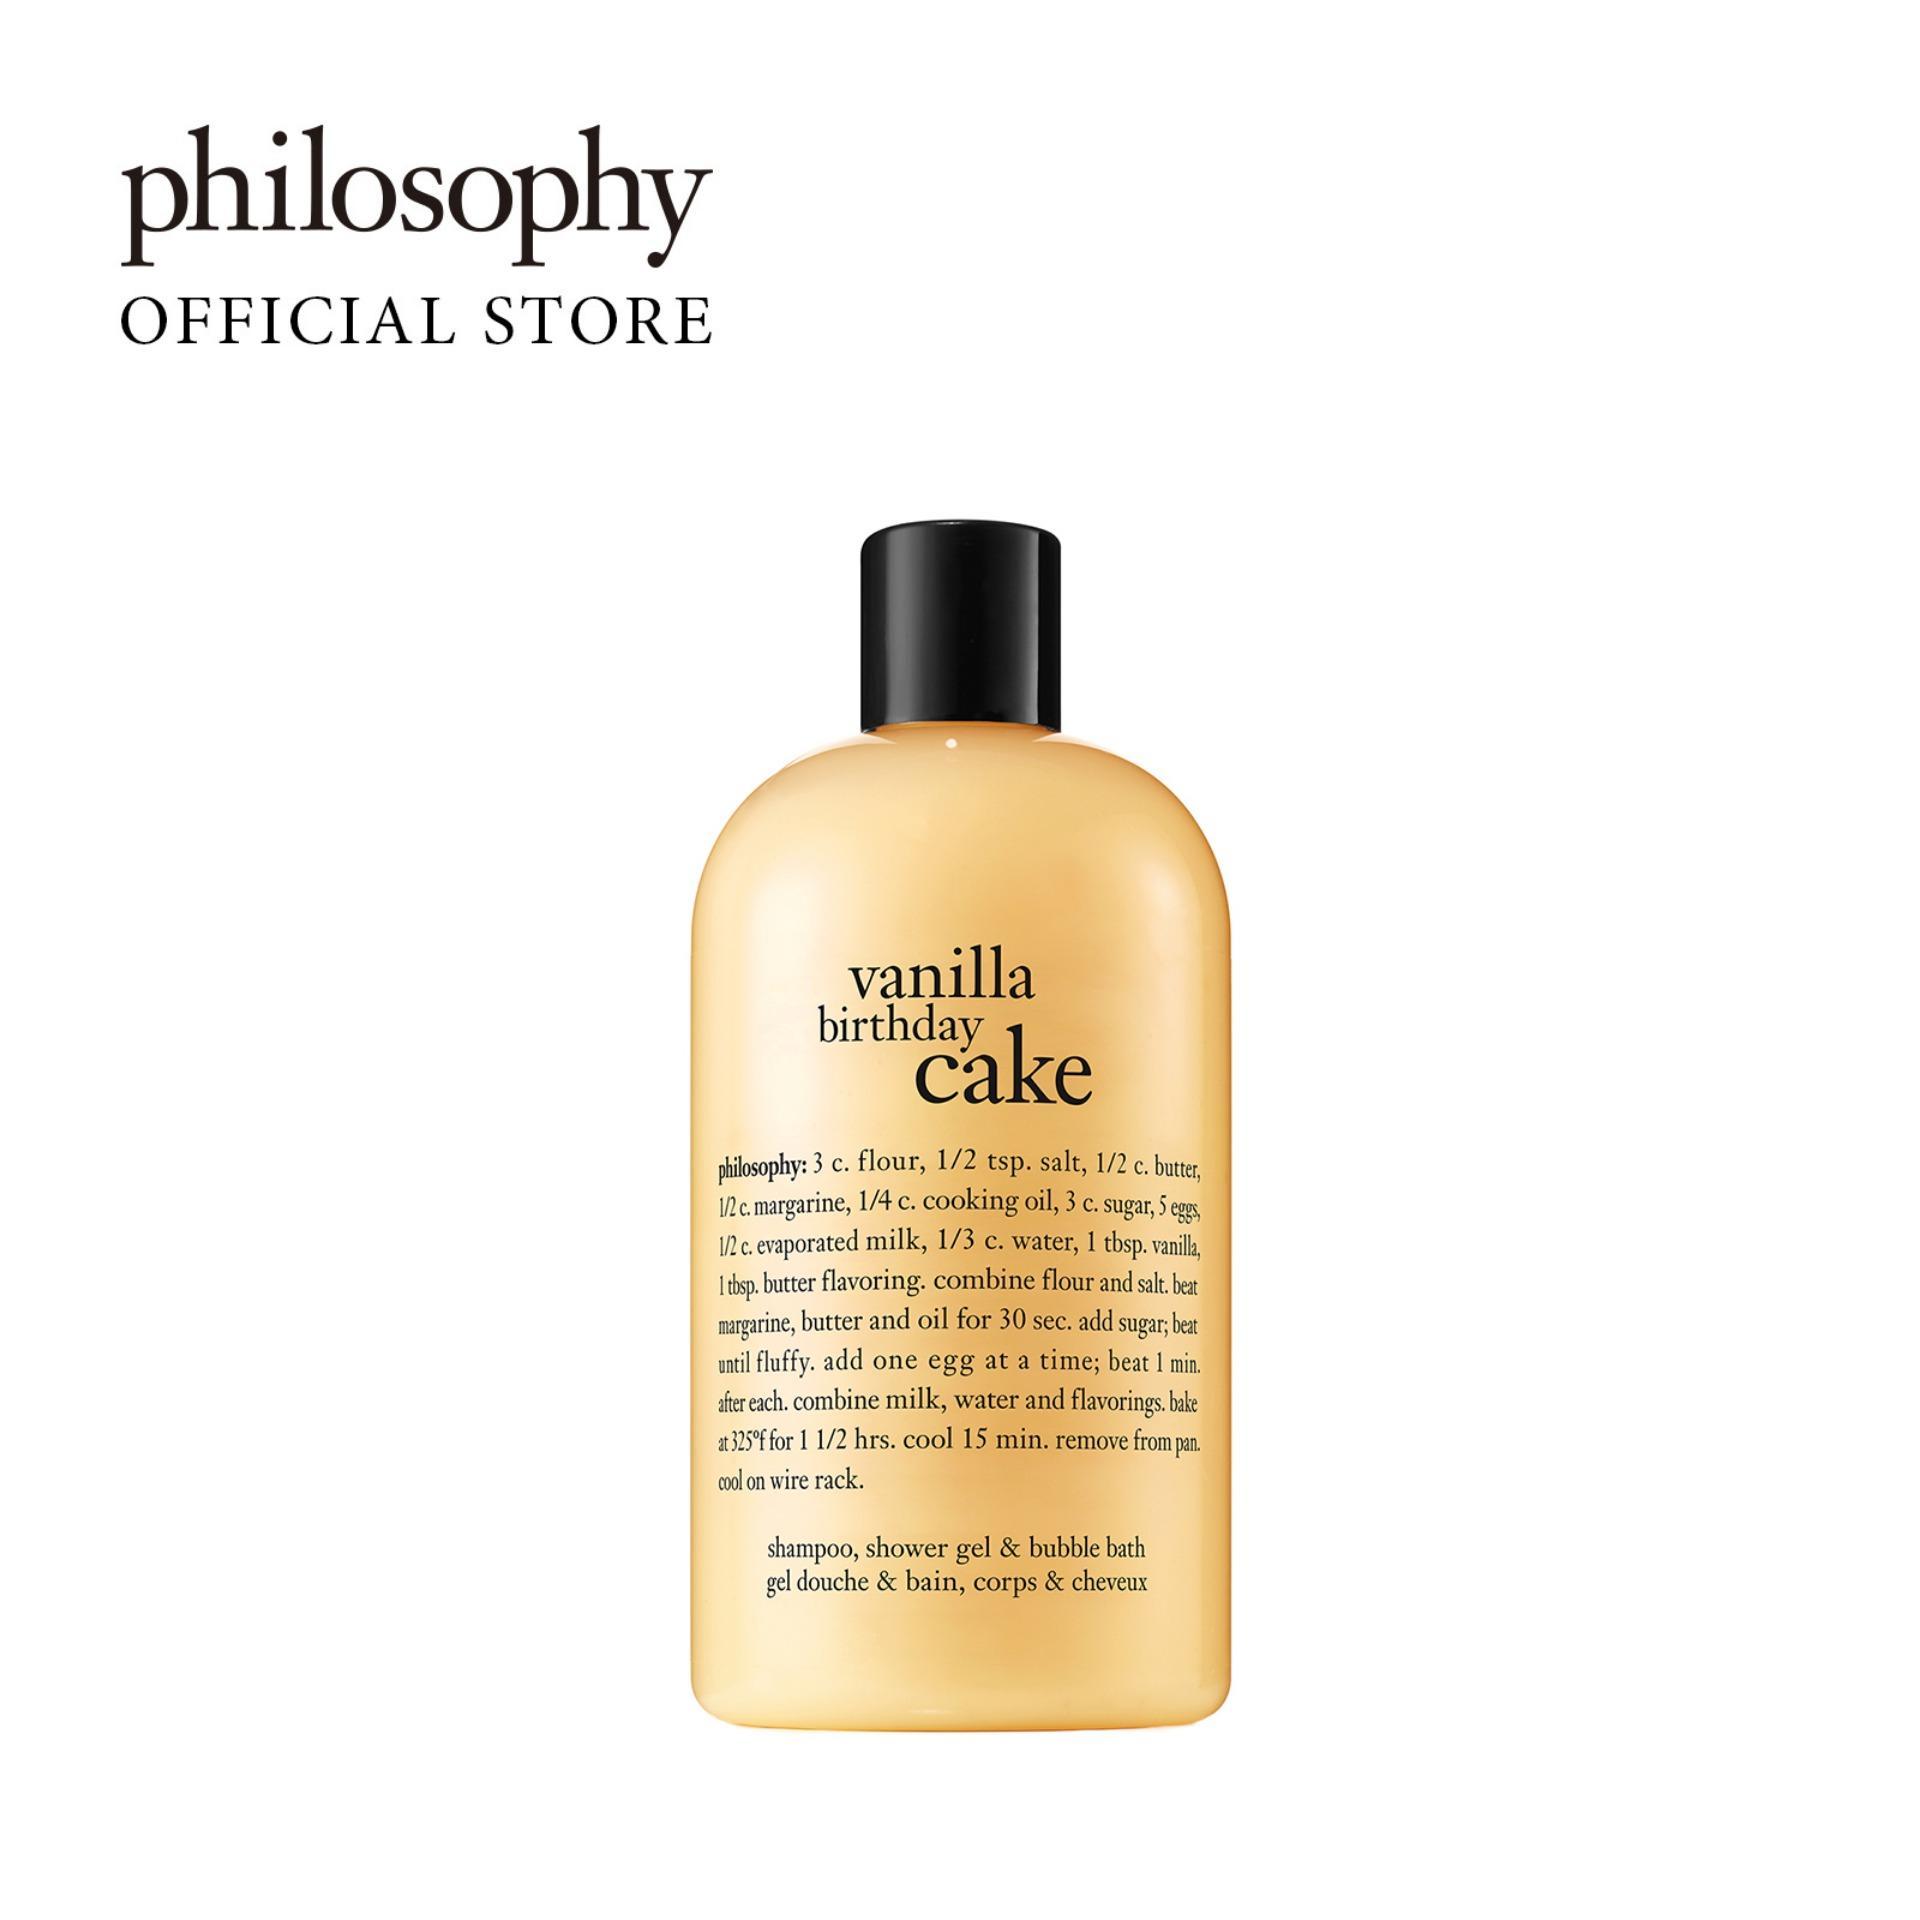 Philosophy Buy Philosophy At Best Price In Singapore Lazada